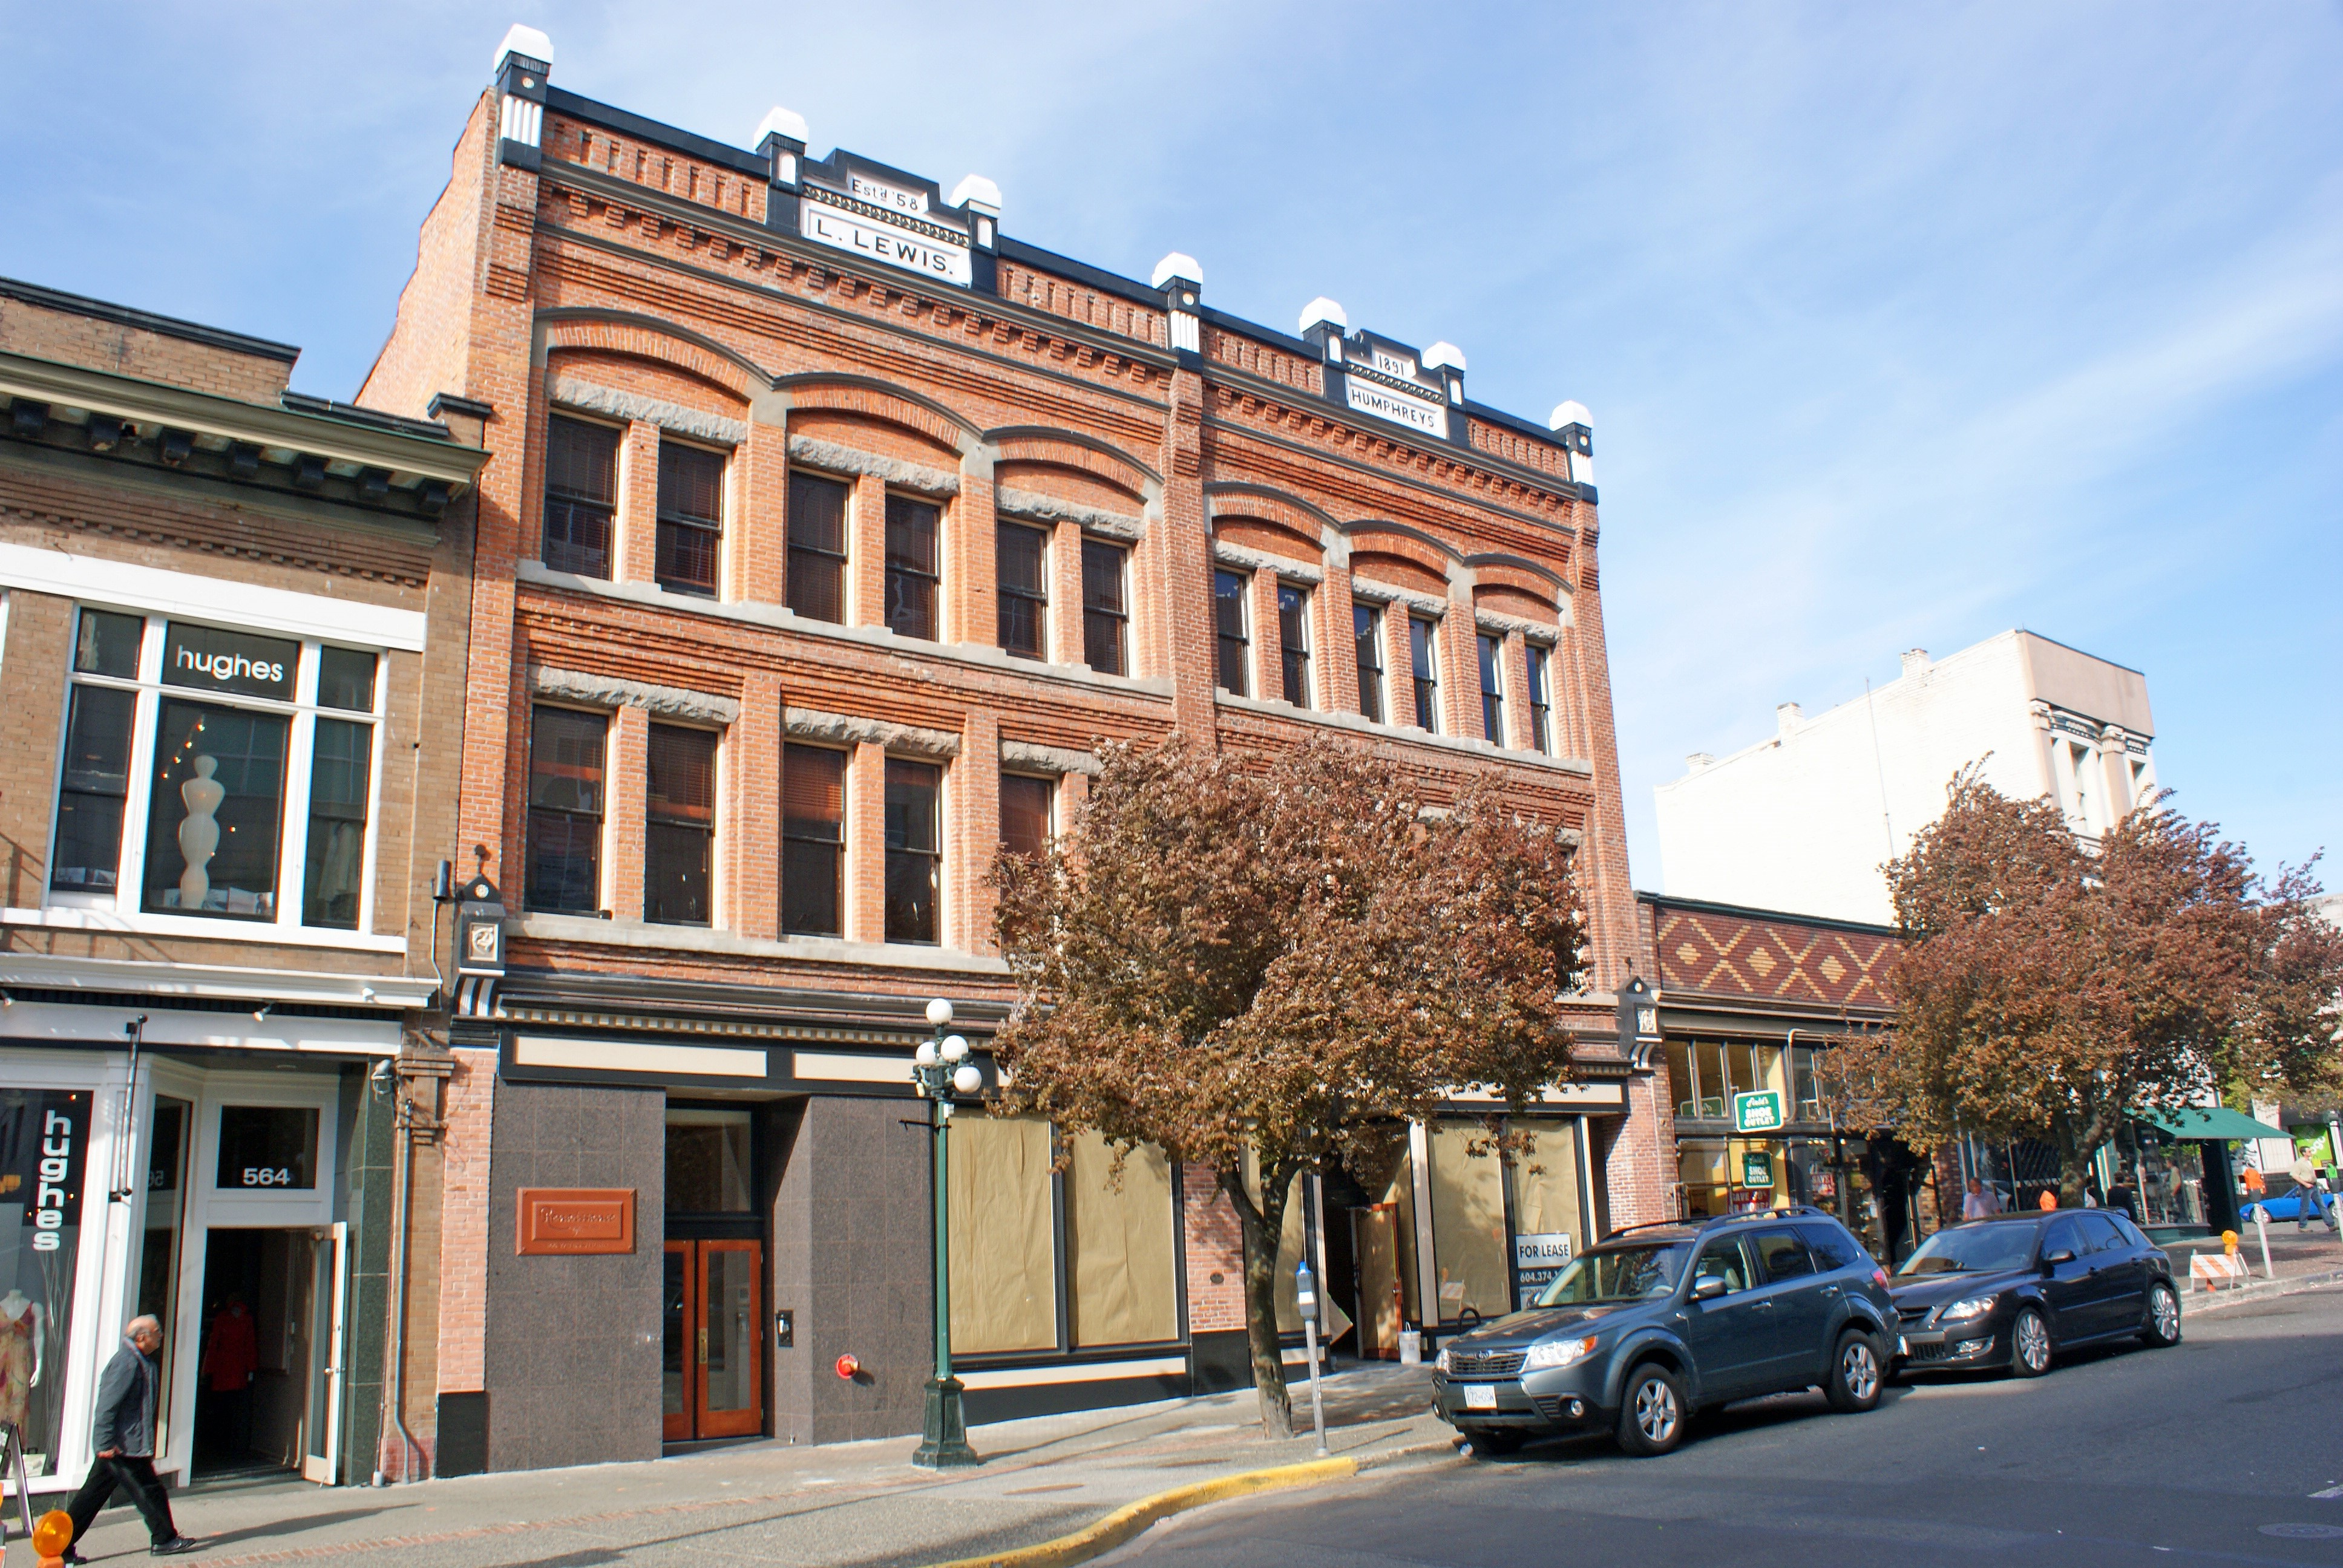 Renaissance Lofts – 566 Yates Street